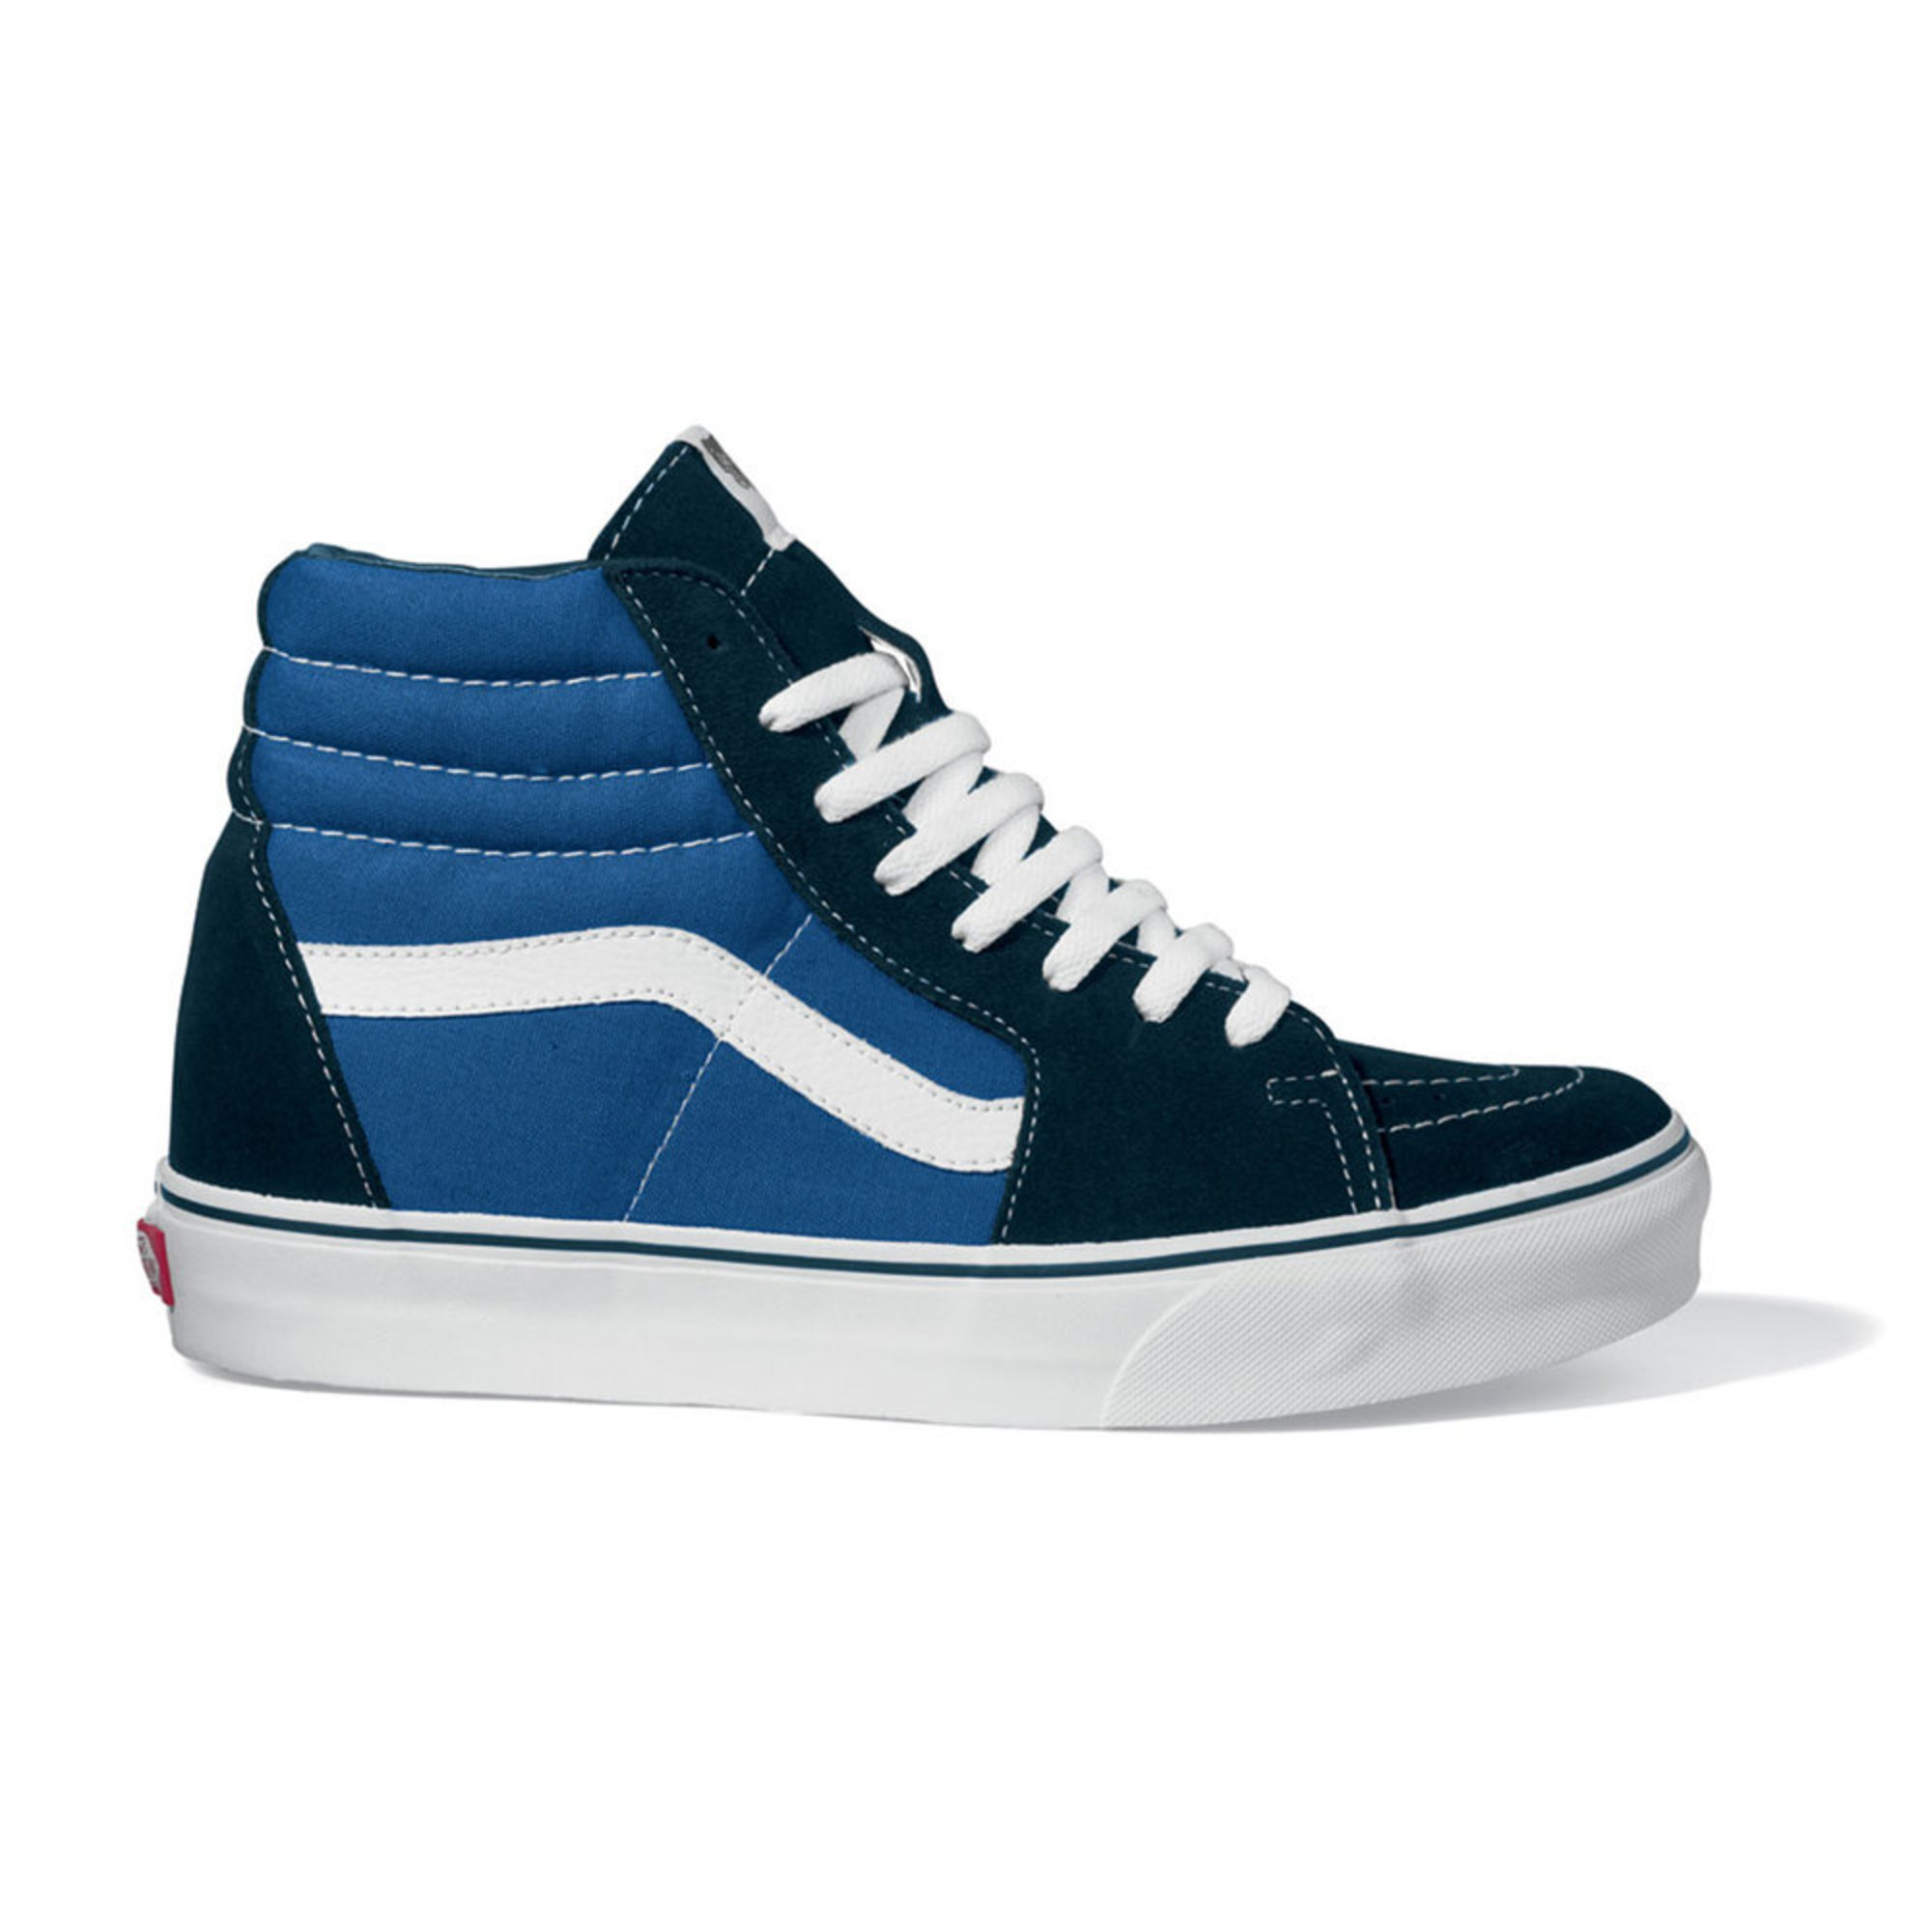 eb7dc12051 Vans. Vans Men s SK8-Hi Skate Shoe